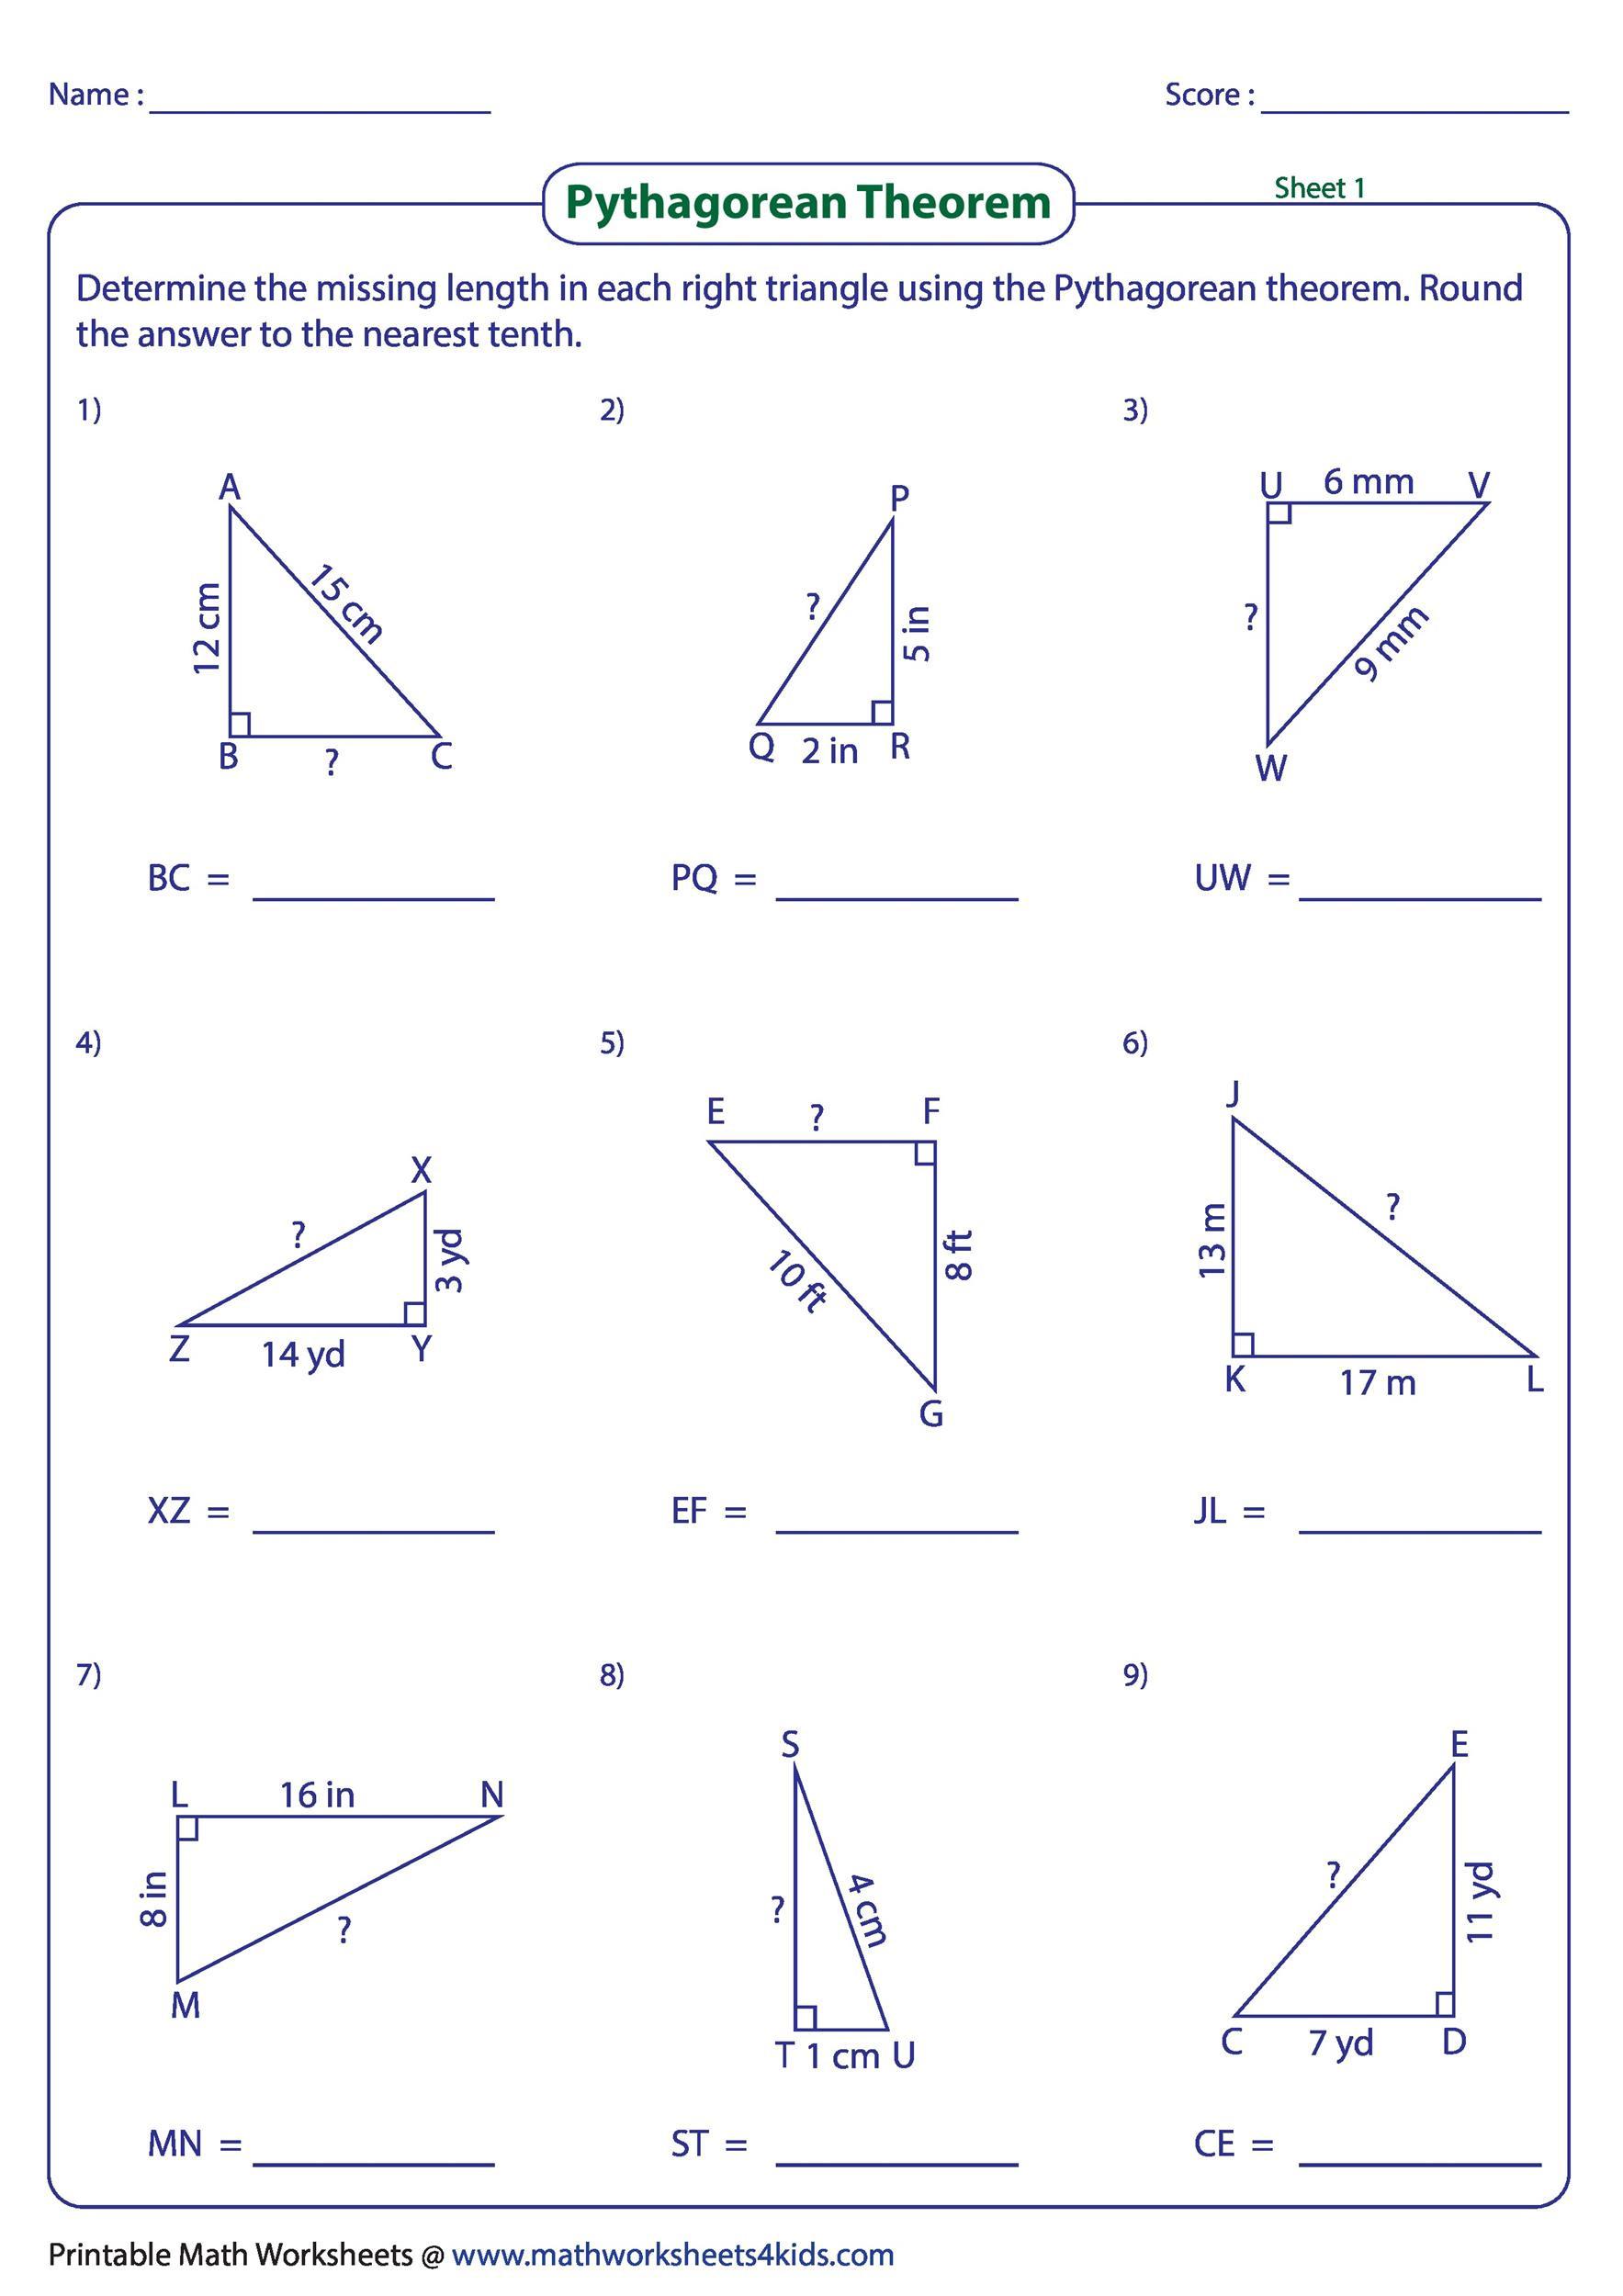 Area Of Trapezoid Worksheet 34 Pythagorean theorem Worksheet Answer Key Worksheet